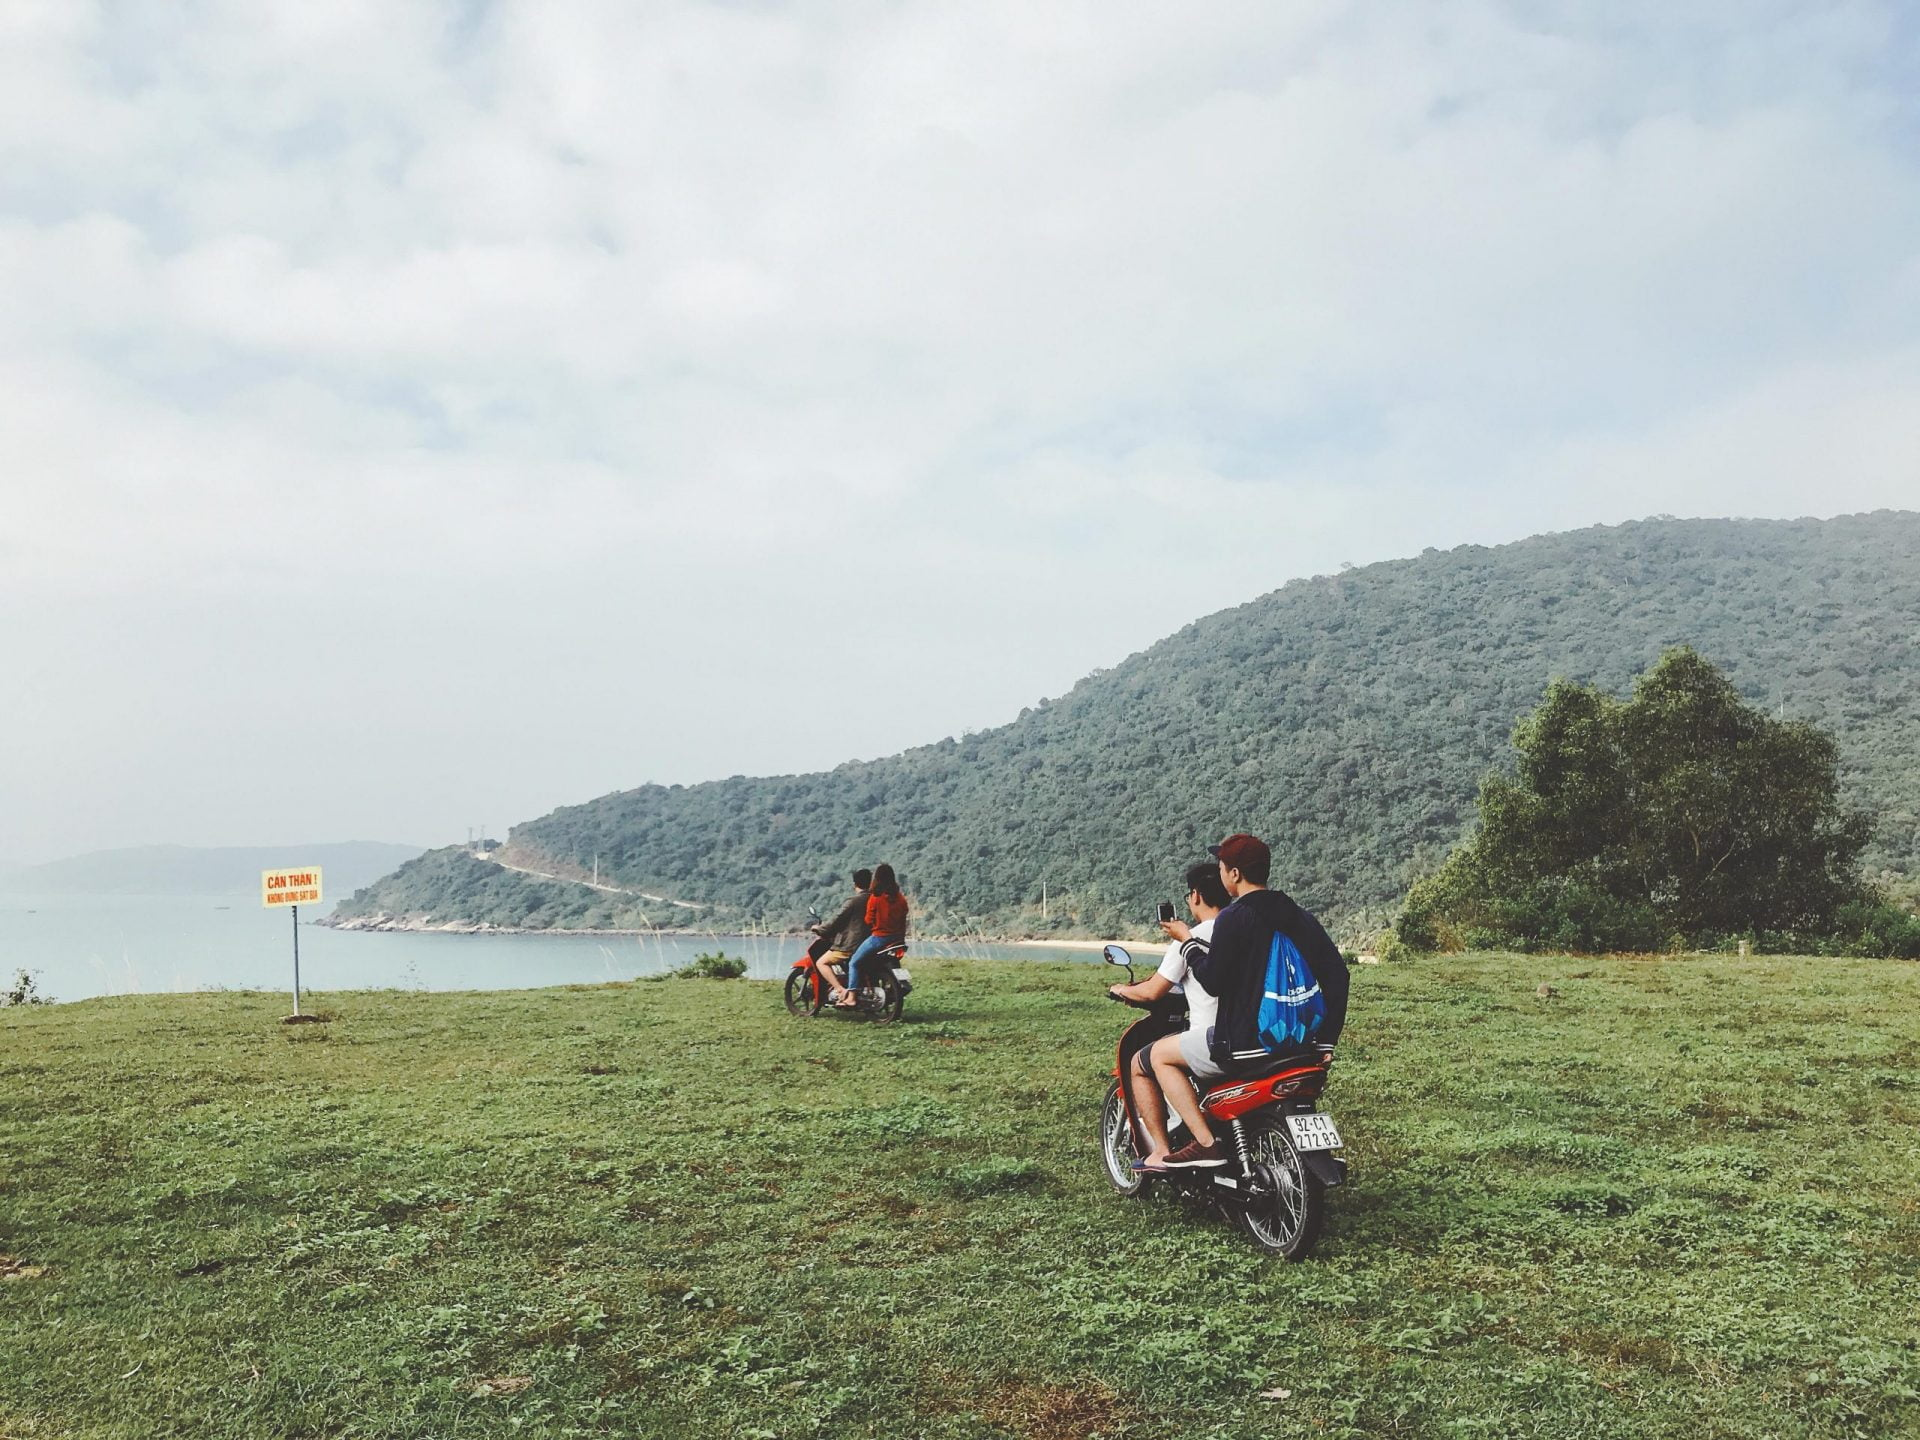 bai dap san bay scaled